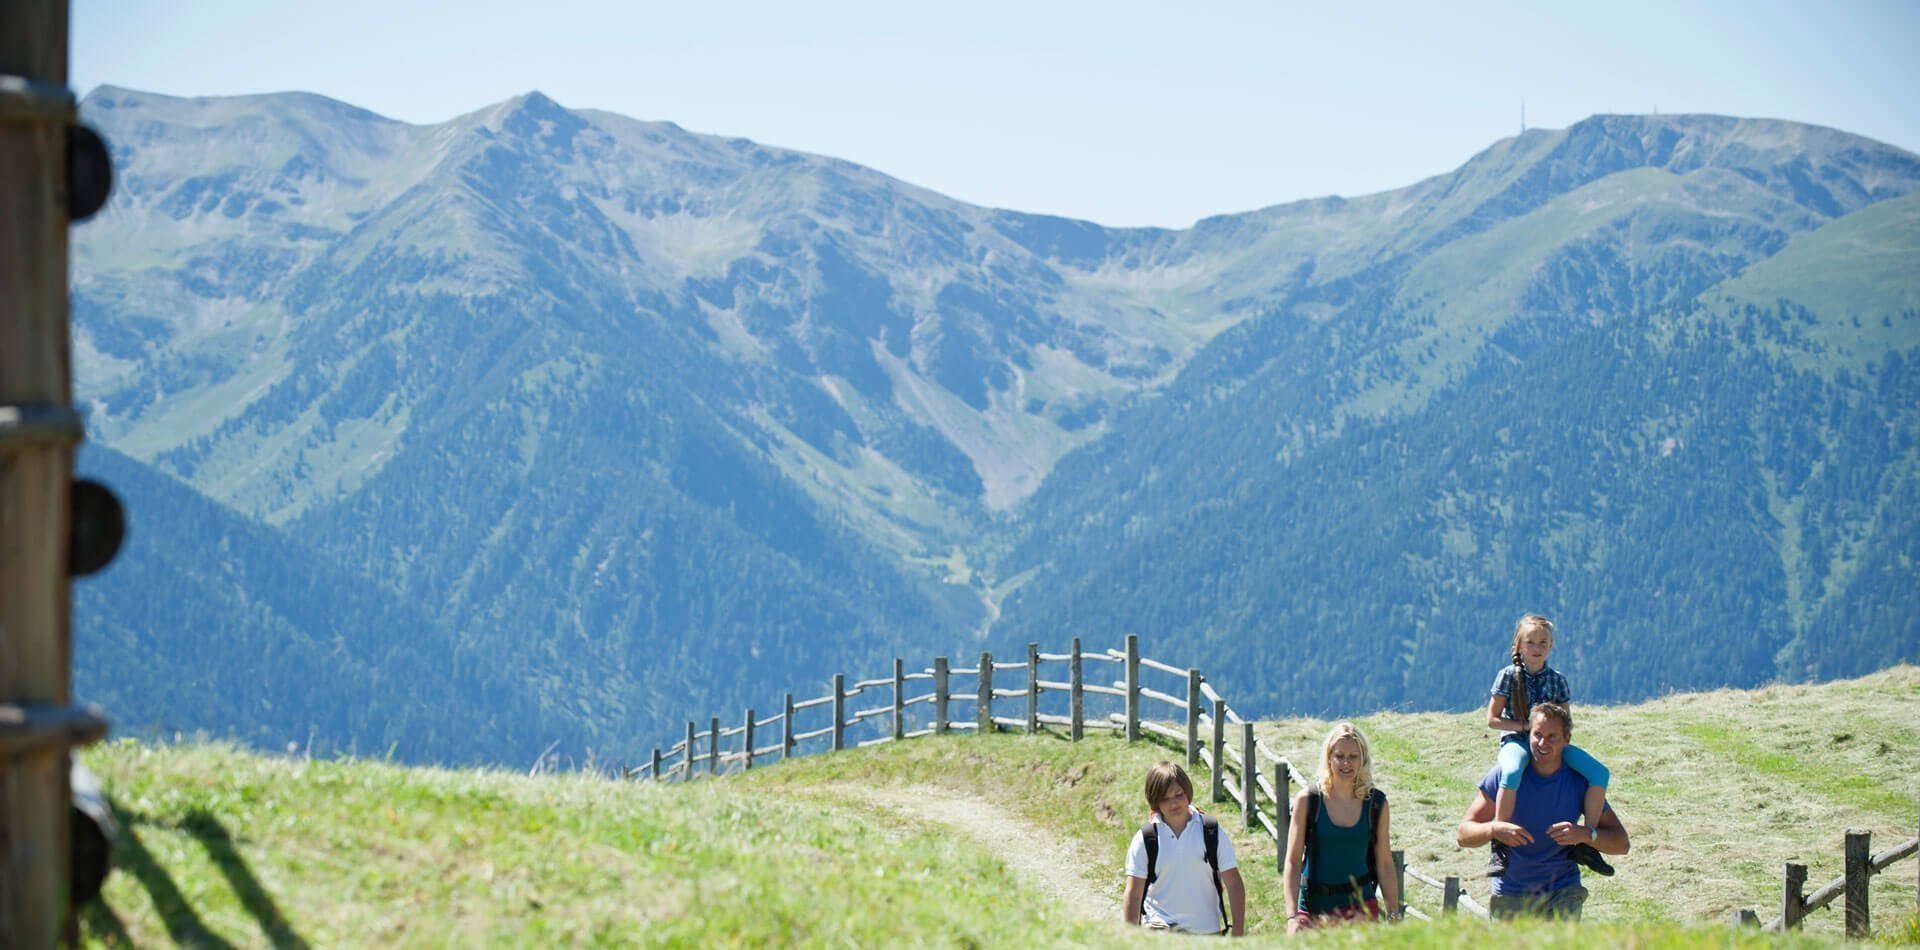 sommerurlaub-in-den-bergen-suedtirol